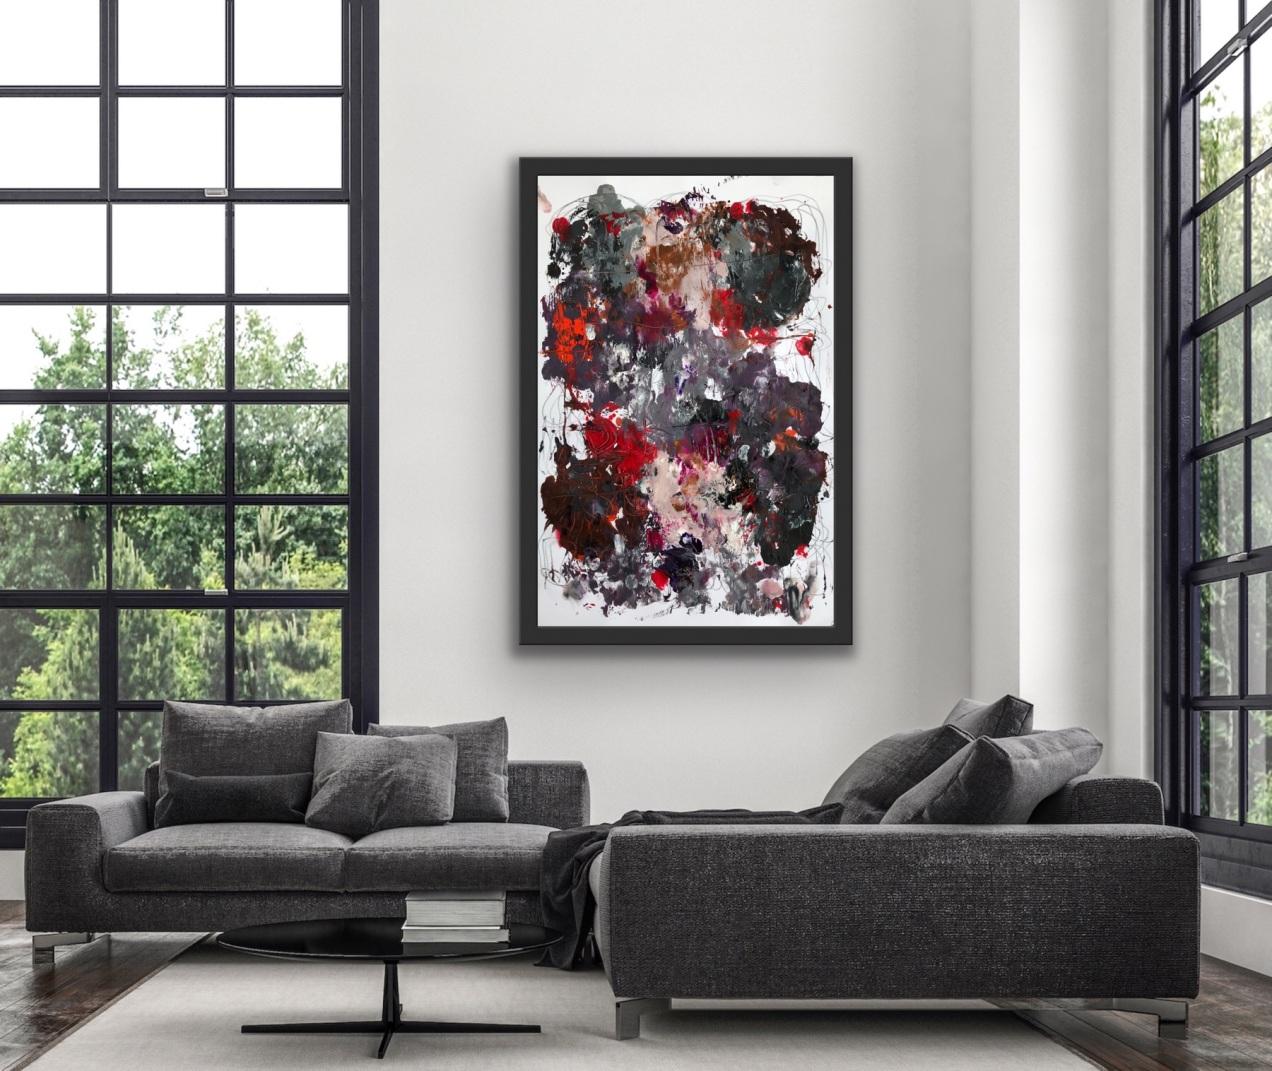 Digital print, abstract art, mixed media, paint,color, line, painting, abstract art, texture, tones, nuance, tints, light, shadow, line, pen, pencil